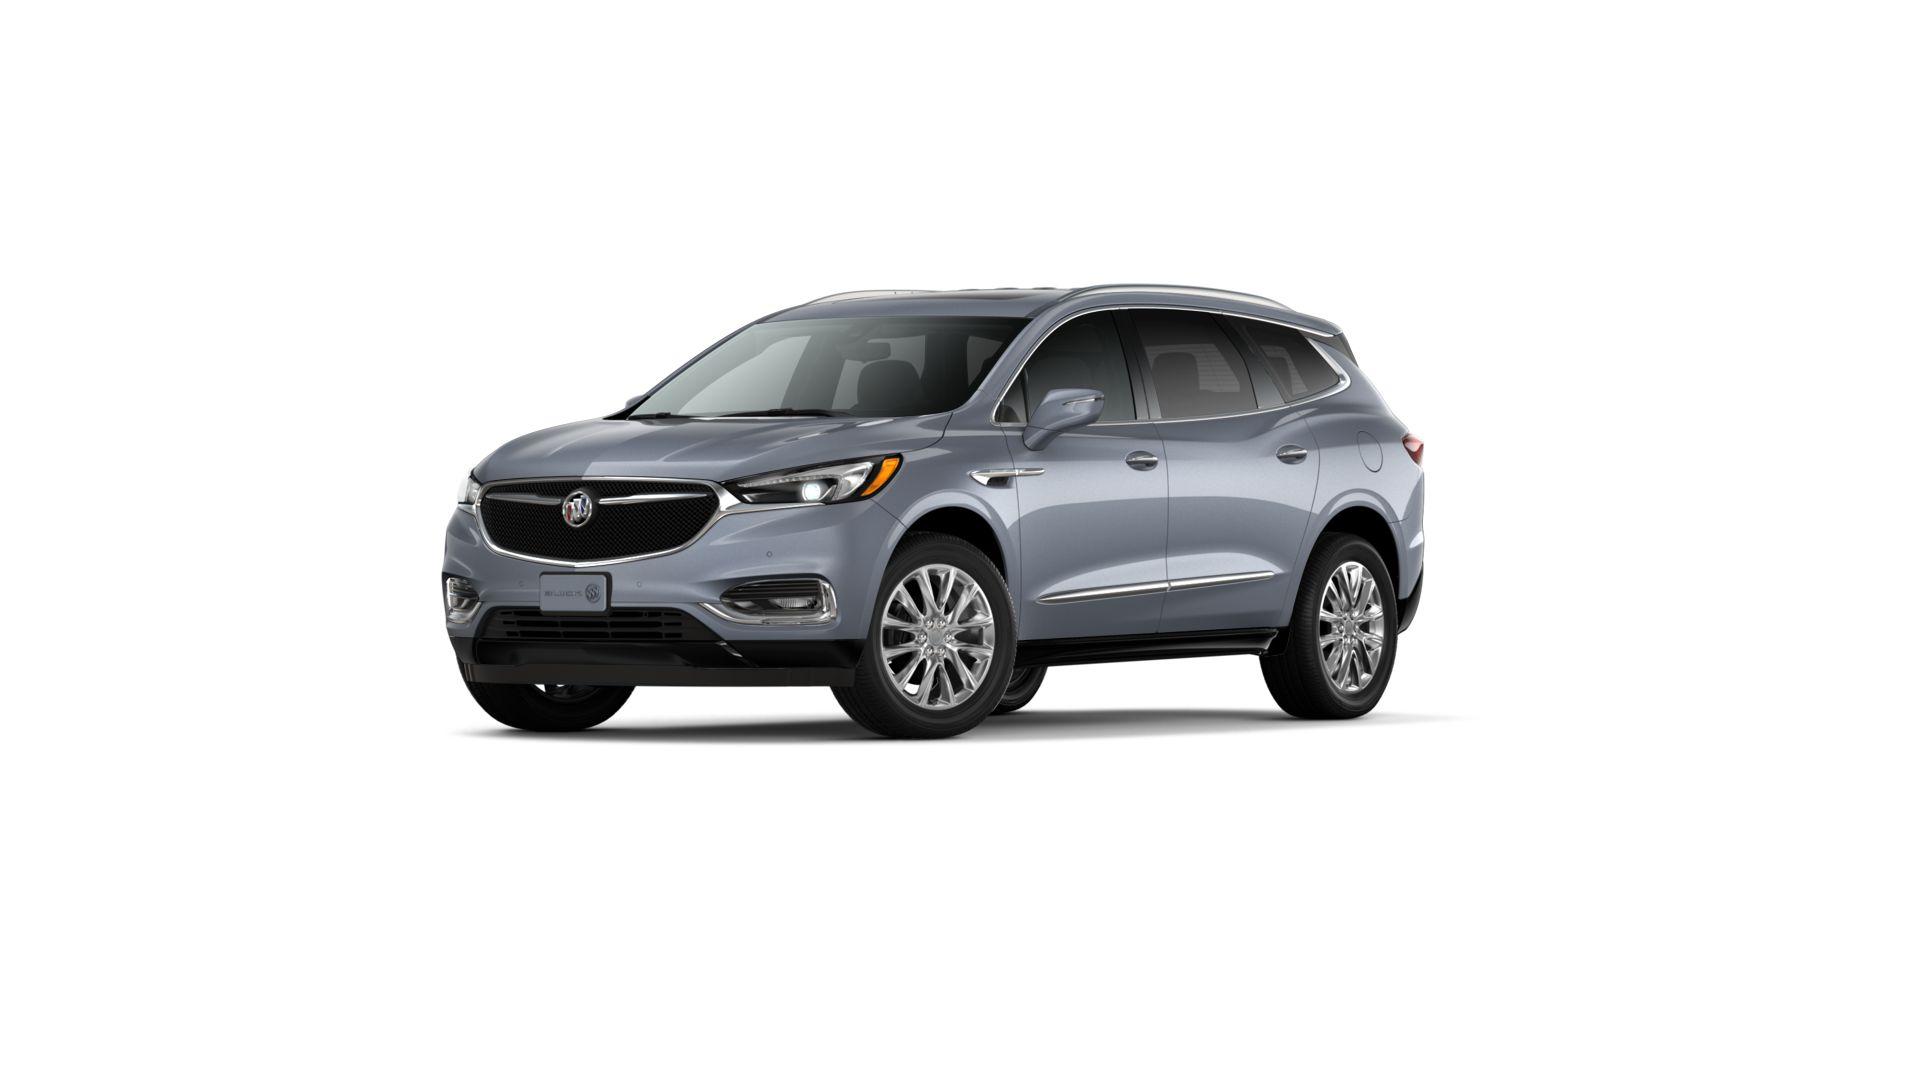 2020 Buick Enclave Premium Crossover